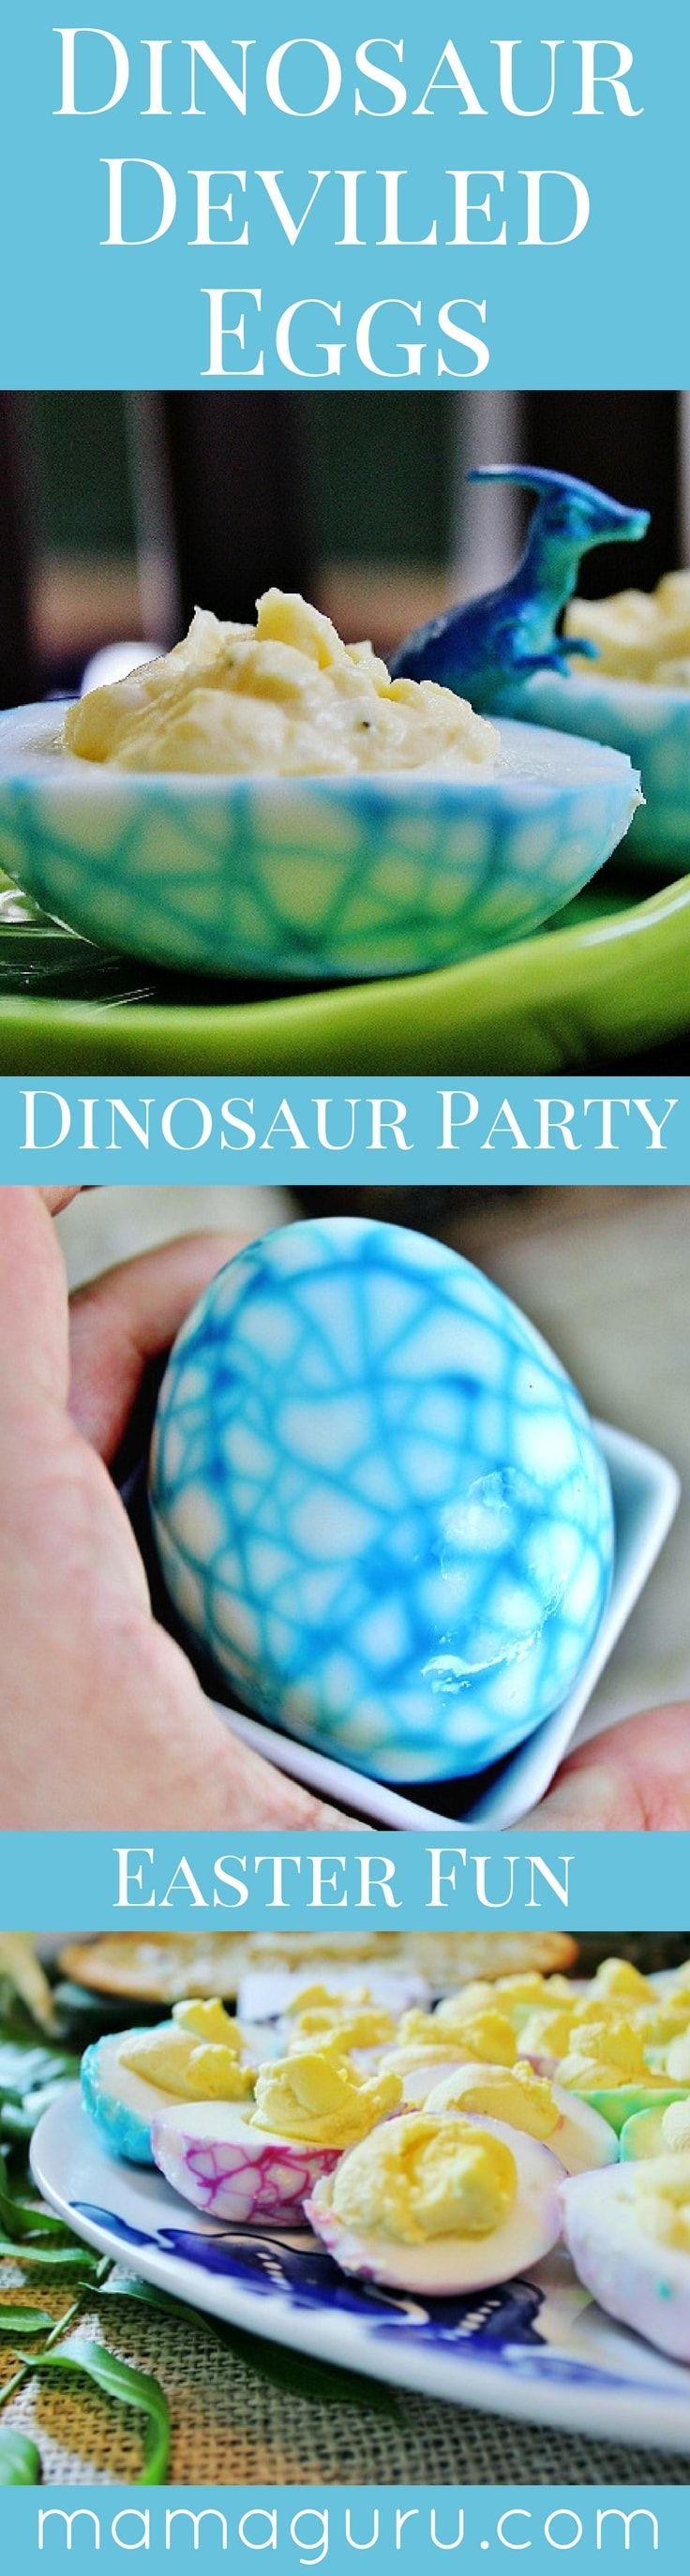 Dinosaur Deviled Egg ♥ Easter Egg ♥ Dinosaur Party ♥ Recipe ♥ Science Fun ♥ Boy Birthday Party